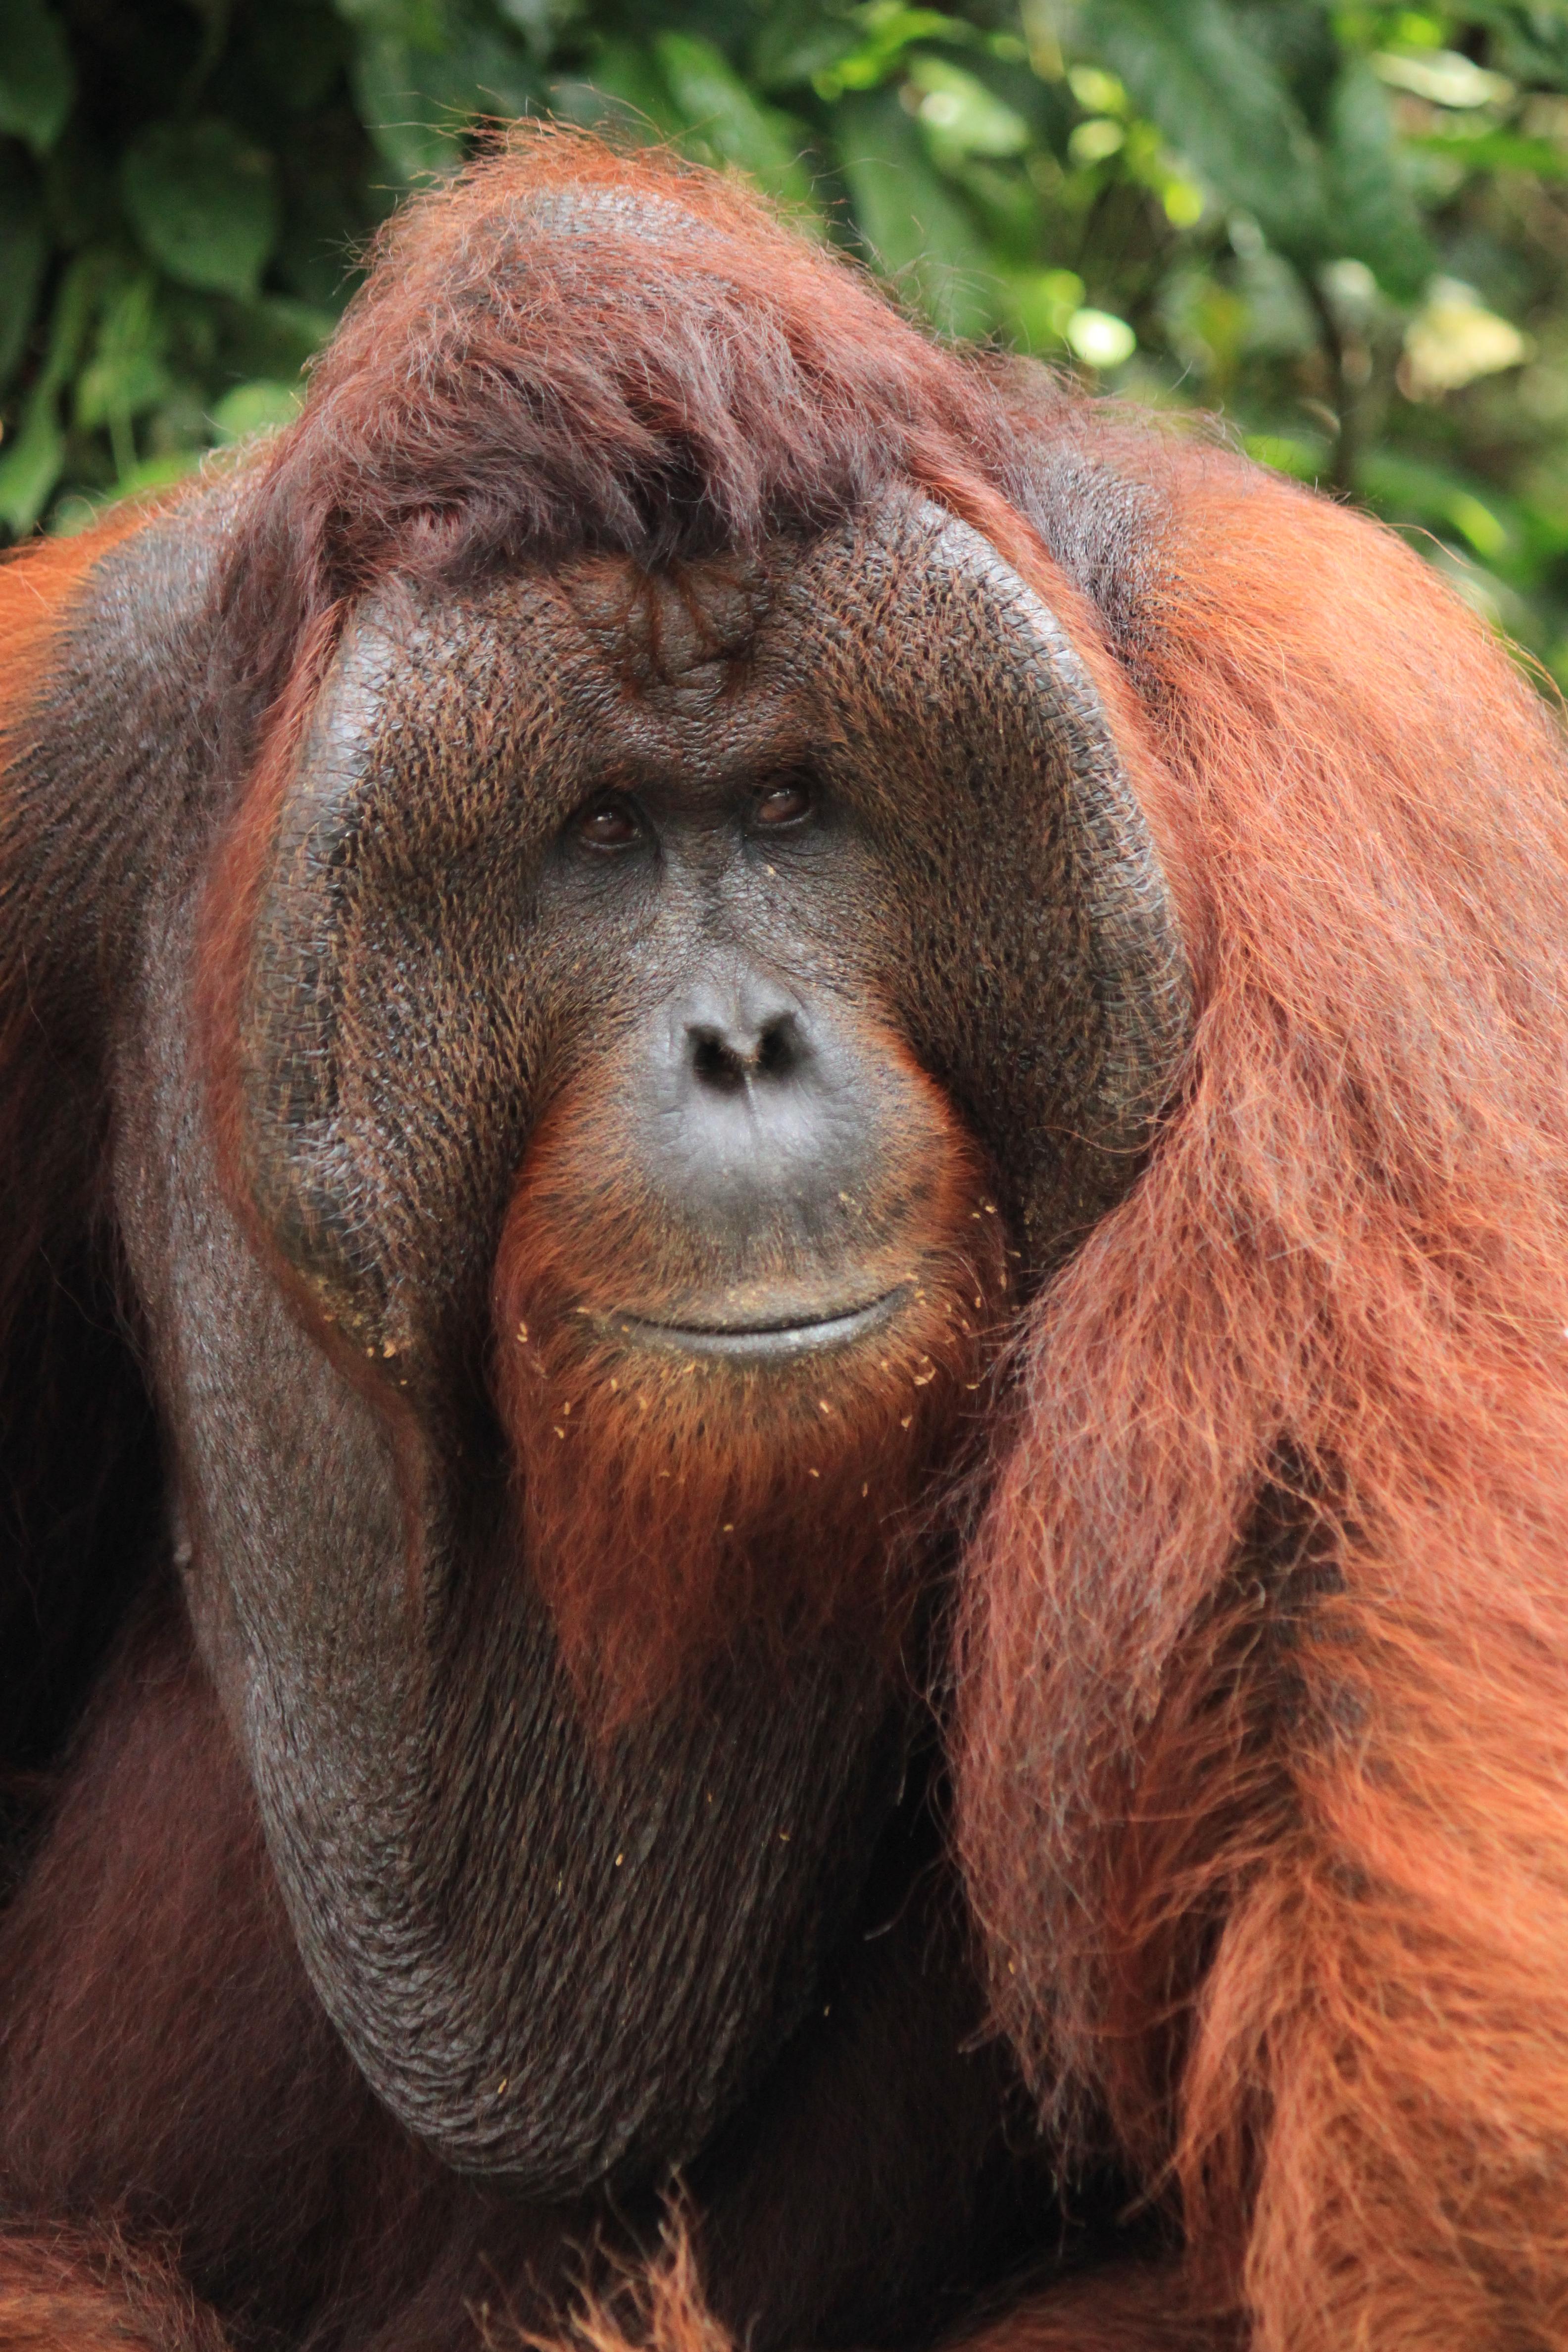 Orangutan has sex with woman